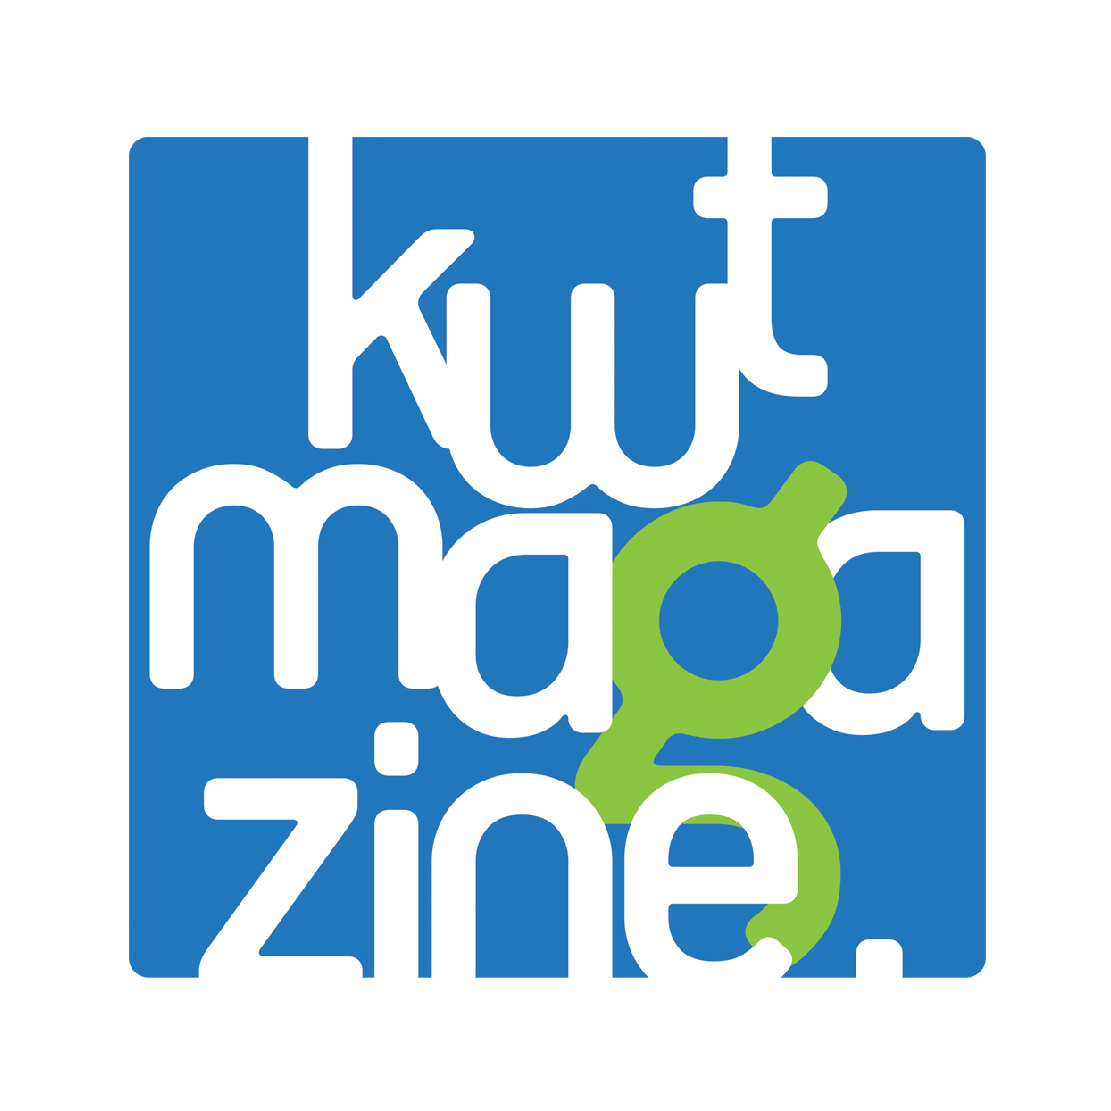 logos-27.jpg